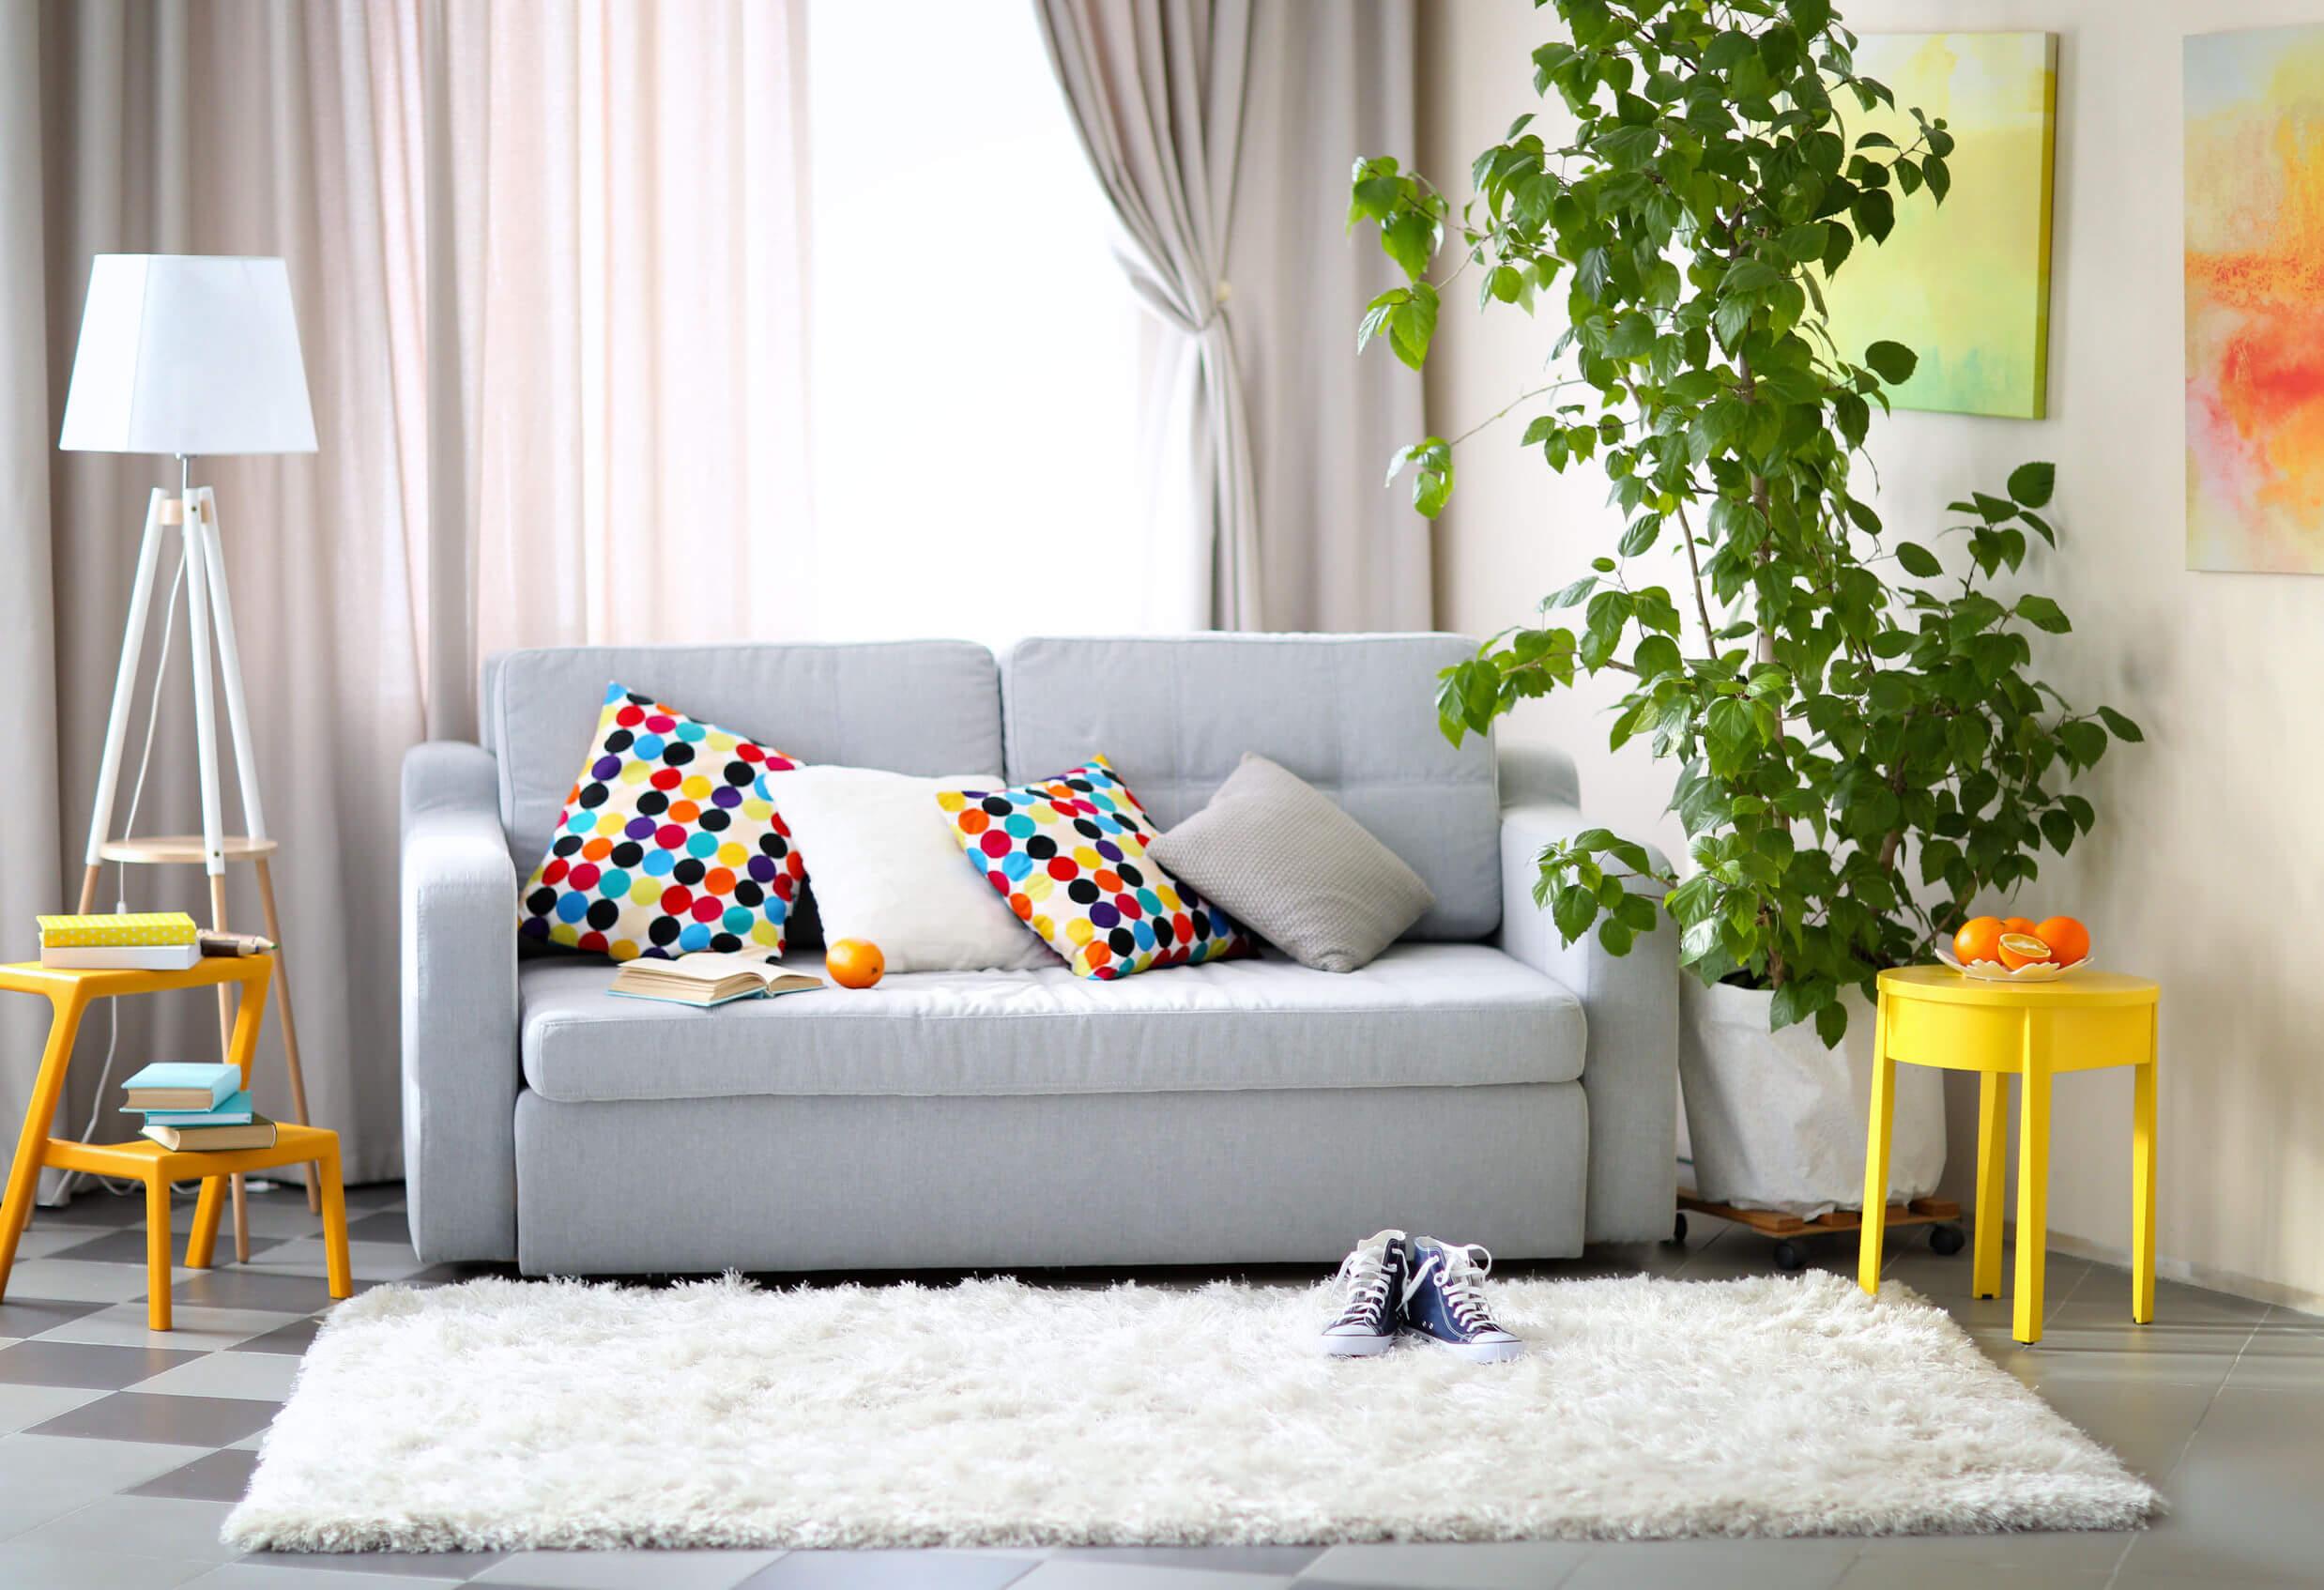 ¿Cómo elegir la alfombra perfecta para tu hogar?